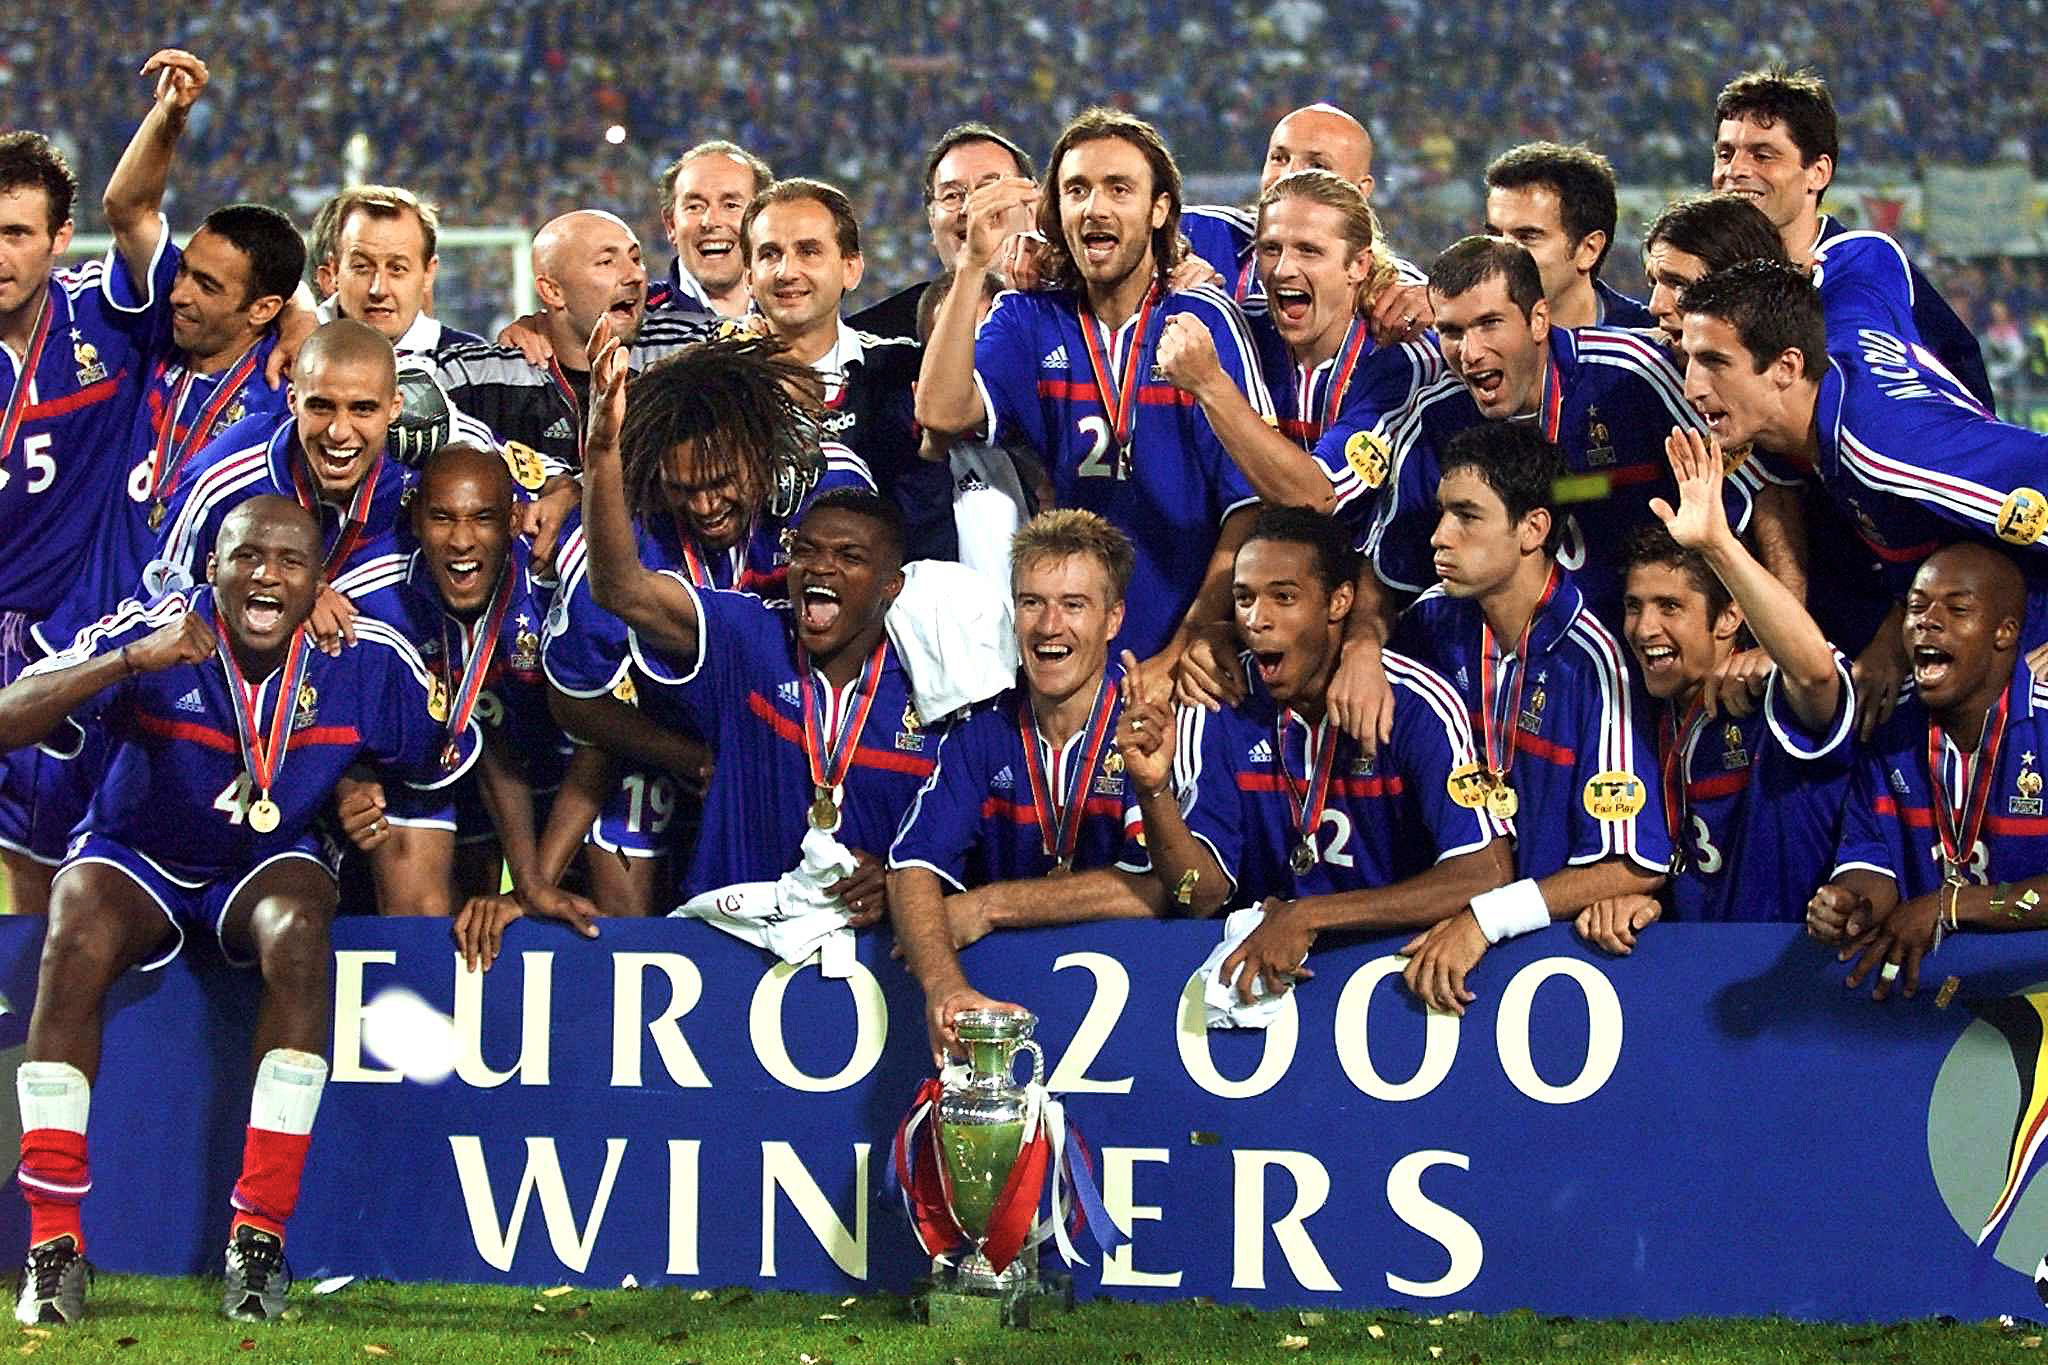 Zidane, Deschamps and France's functional Euro 2000 winners